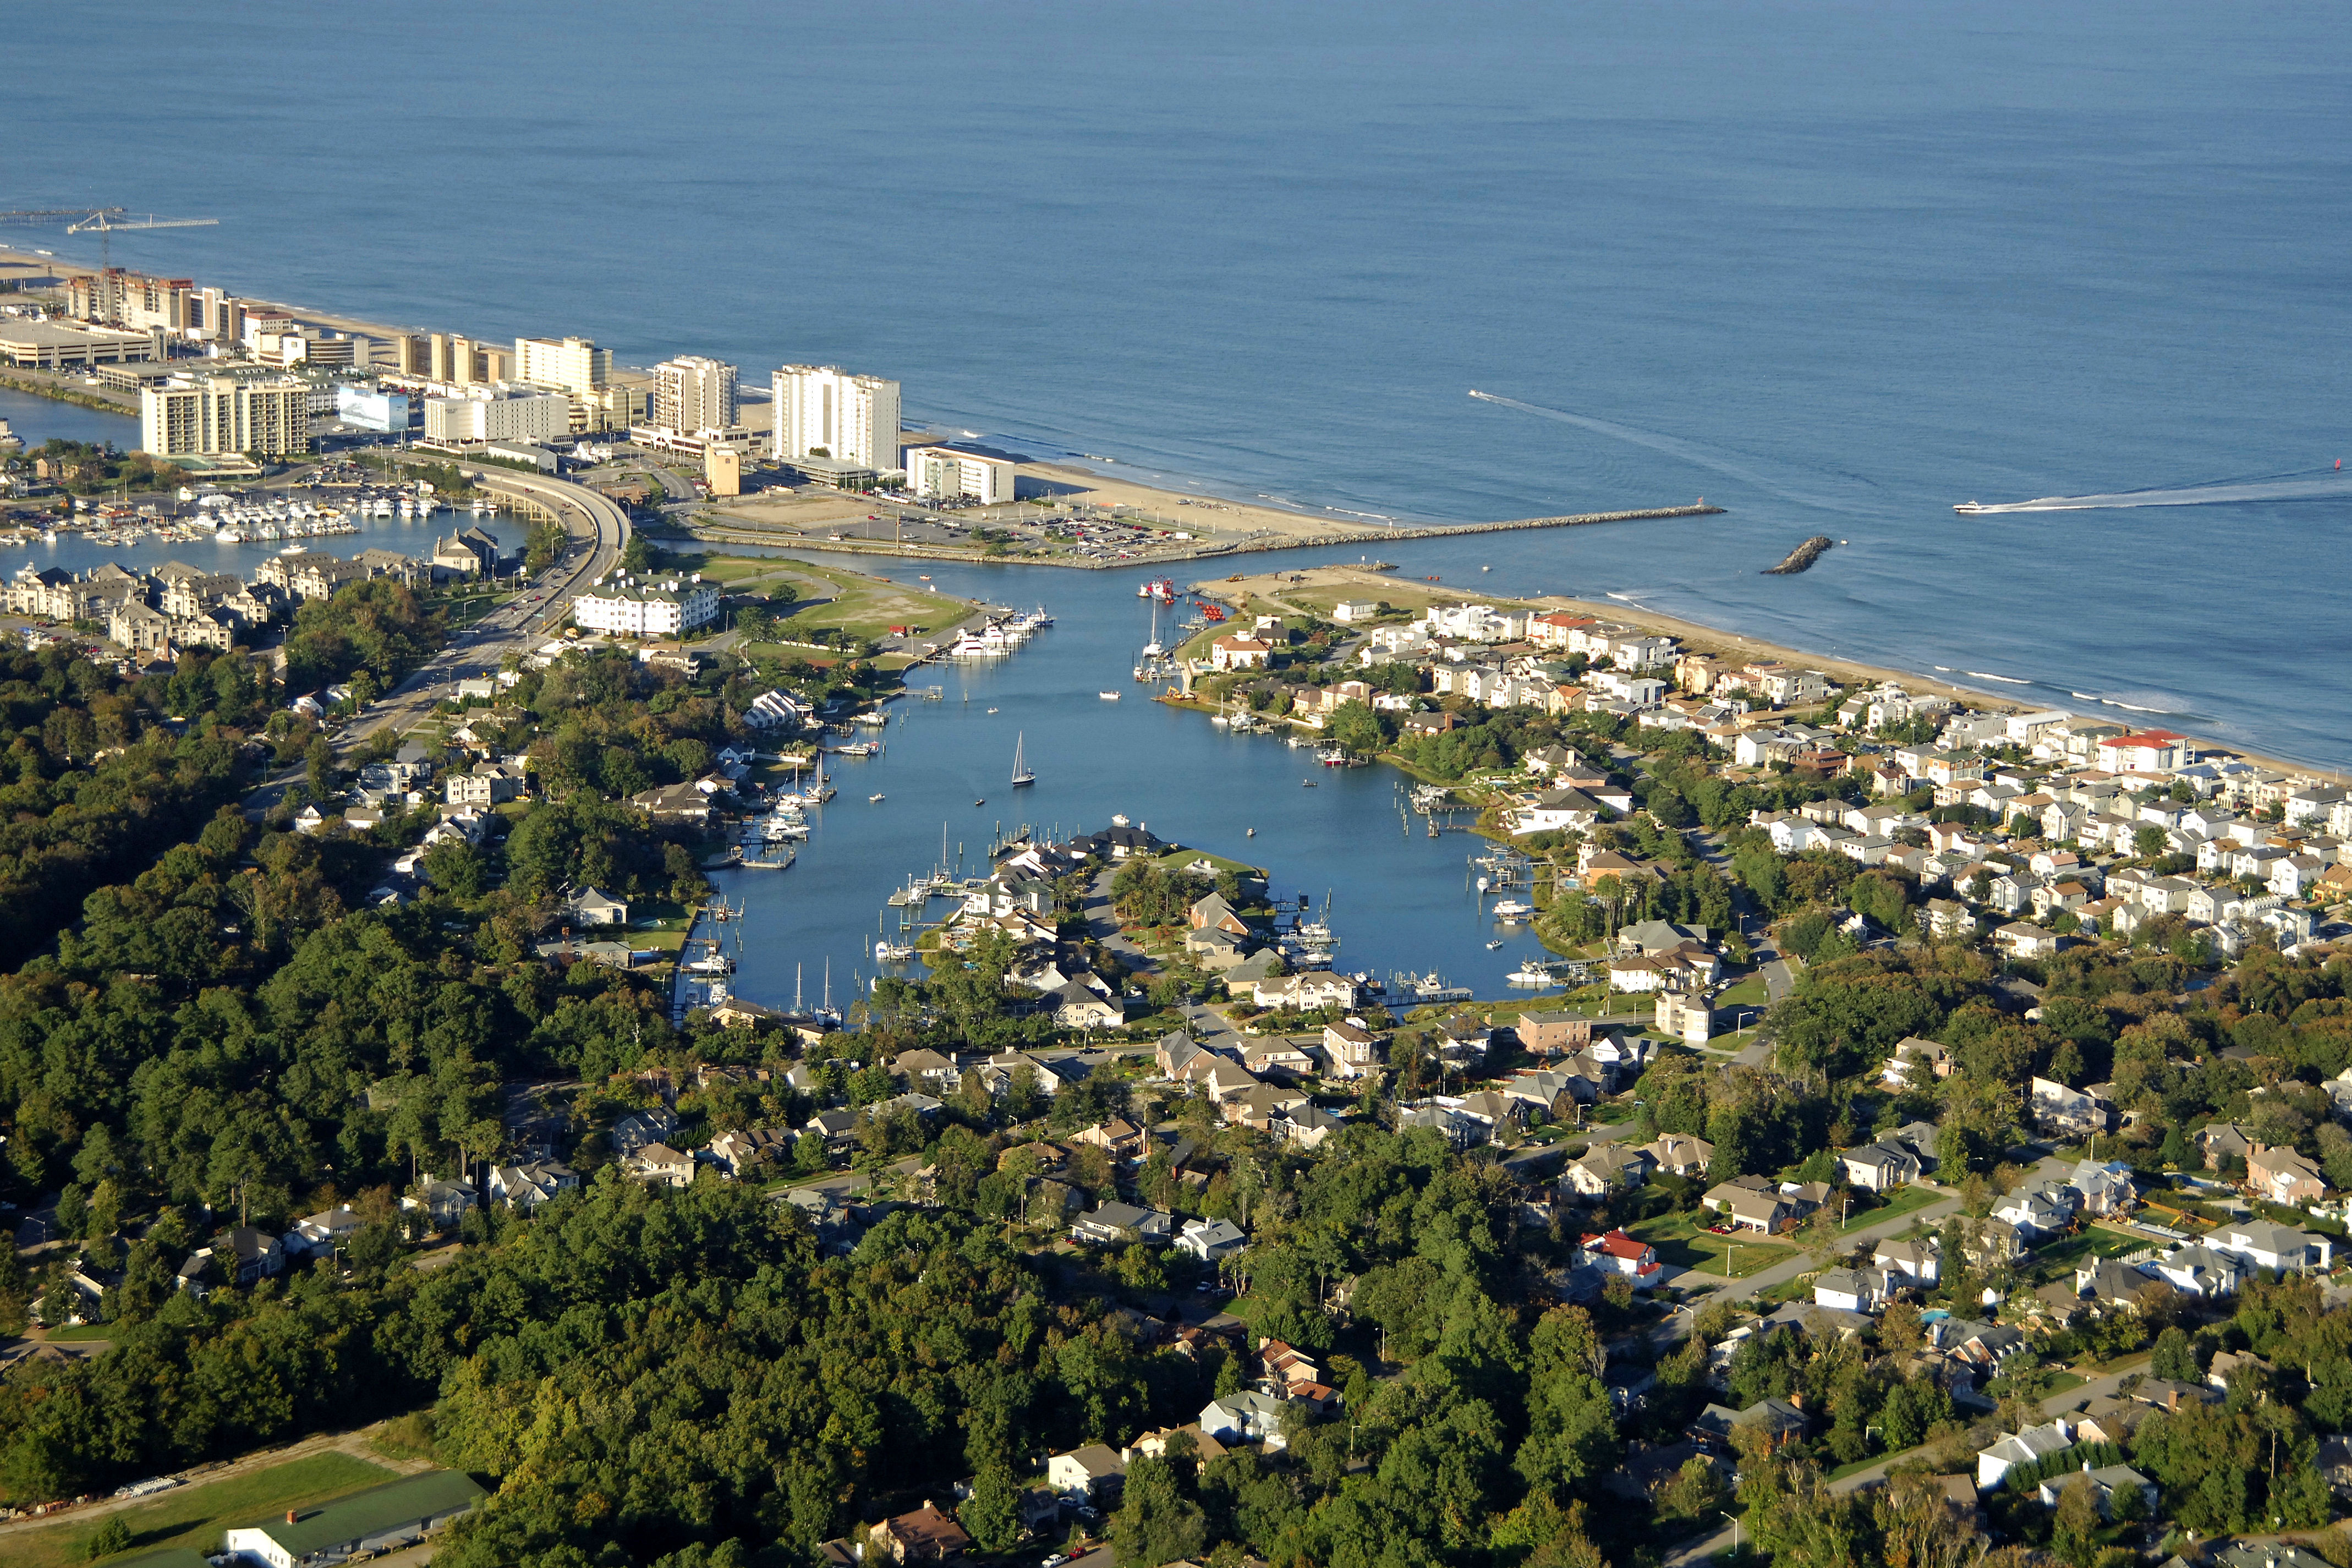 Rudee Inlet Virginia Beach Fishing Center